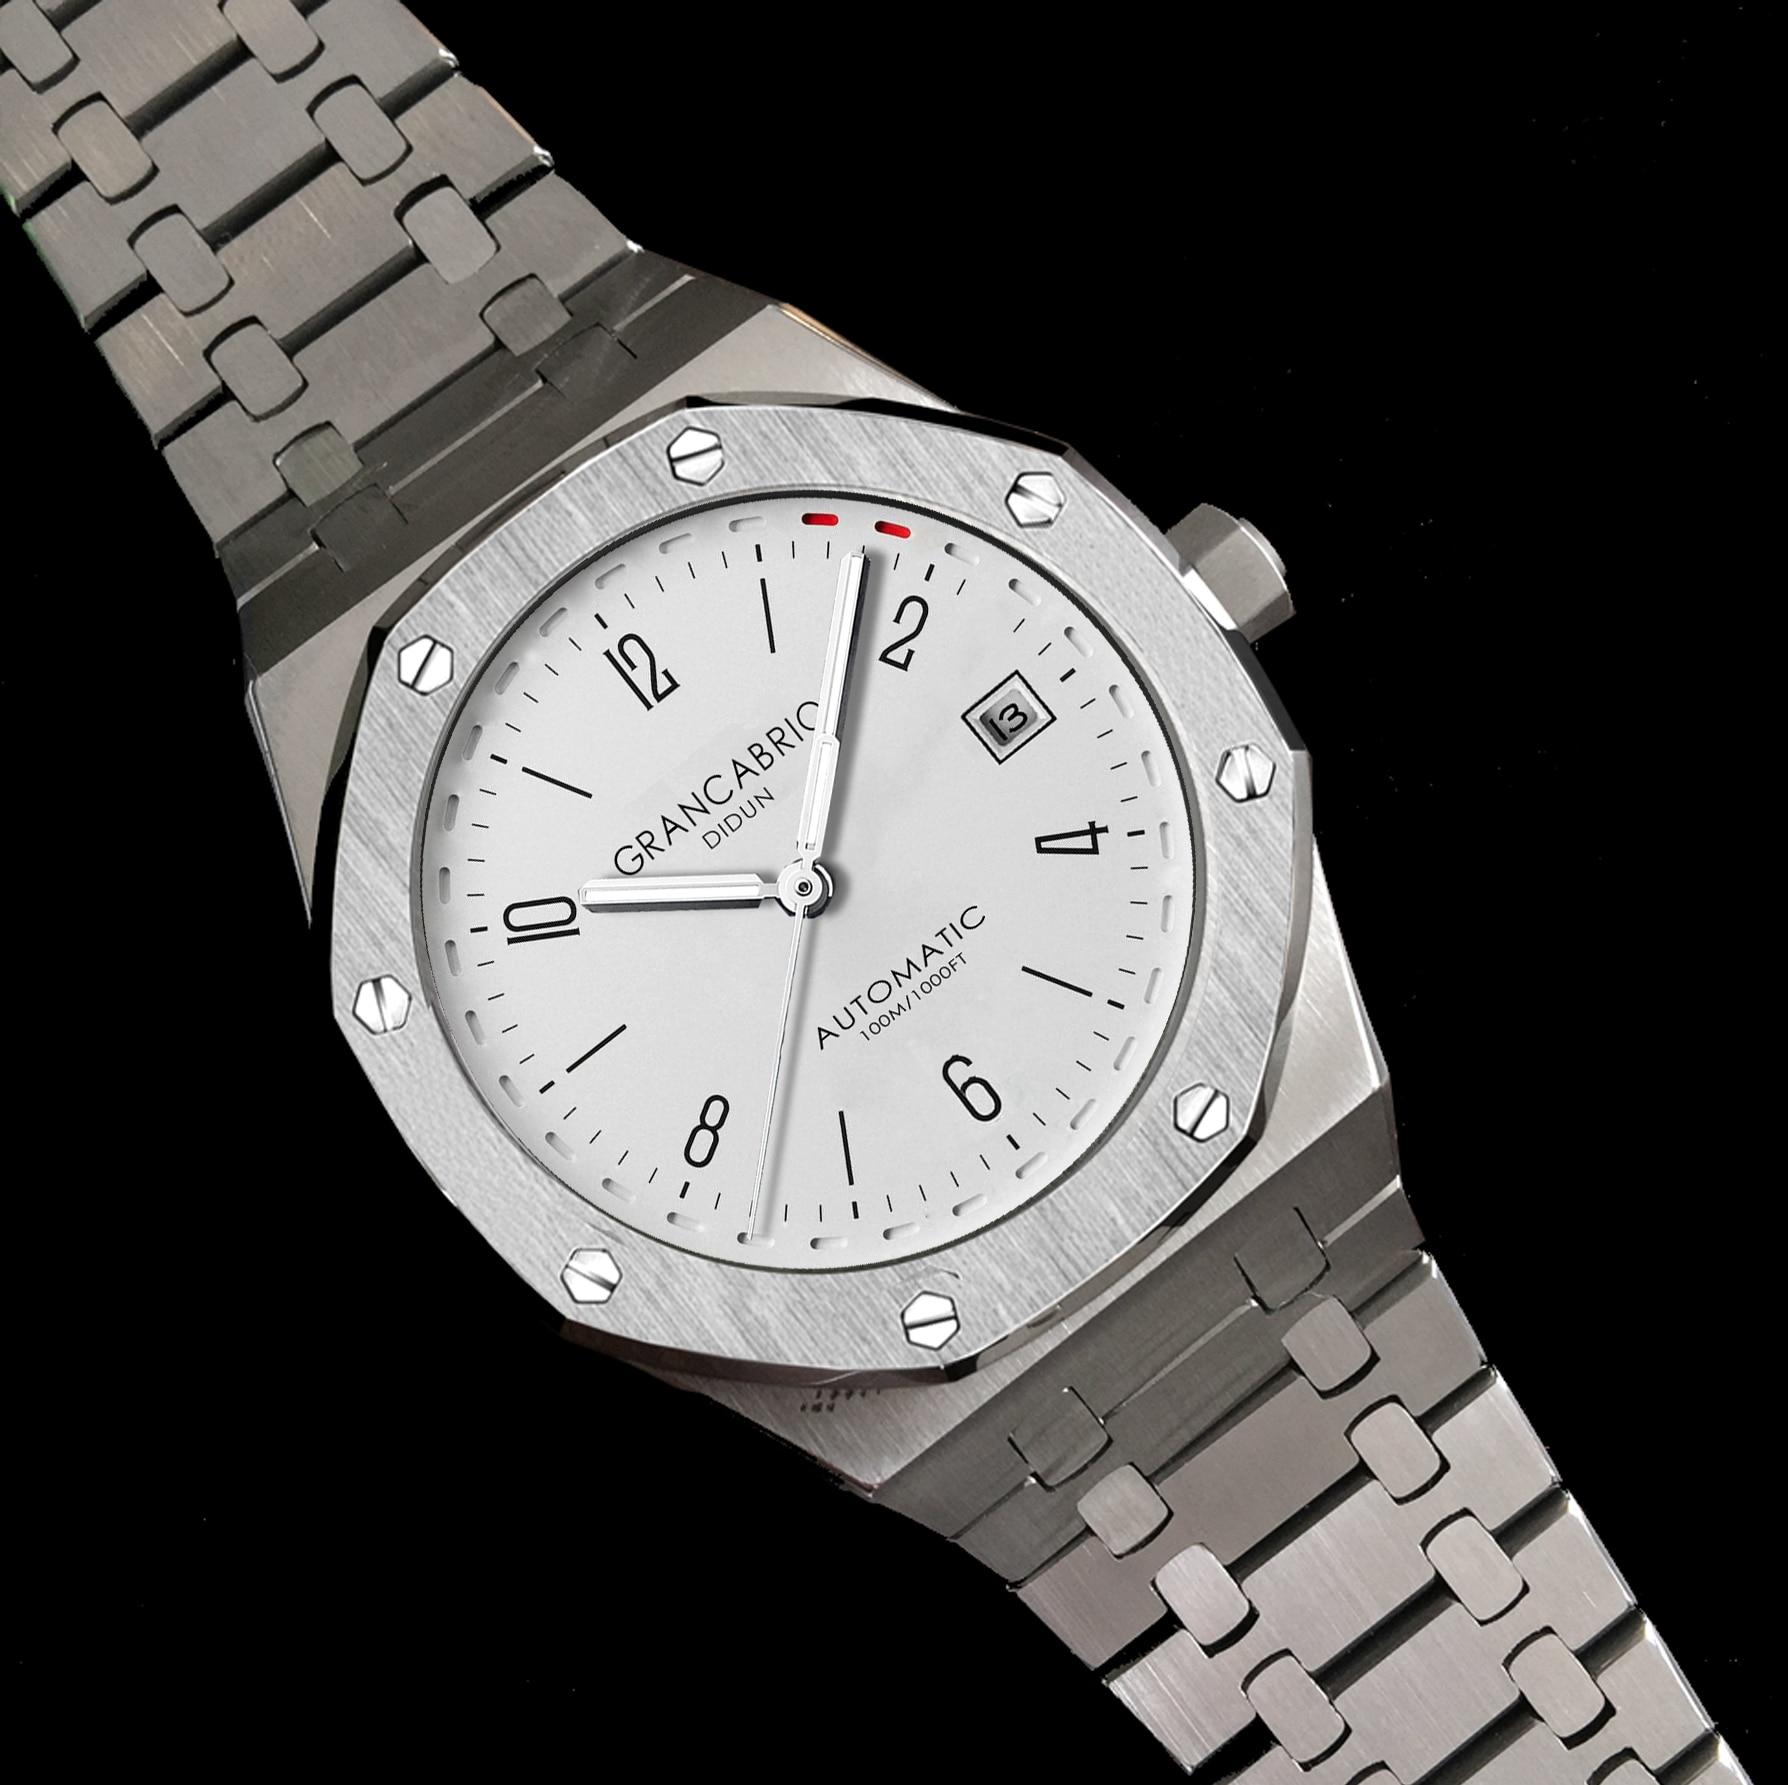 DIDUN Men Watch Top Brand Luxury Mechanical Automatic Watch Fashion Sports Watch Steel Strap Waterproof Watch in Mechanical Watches from Watches